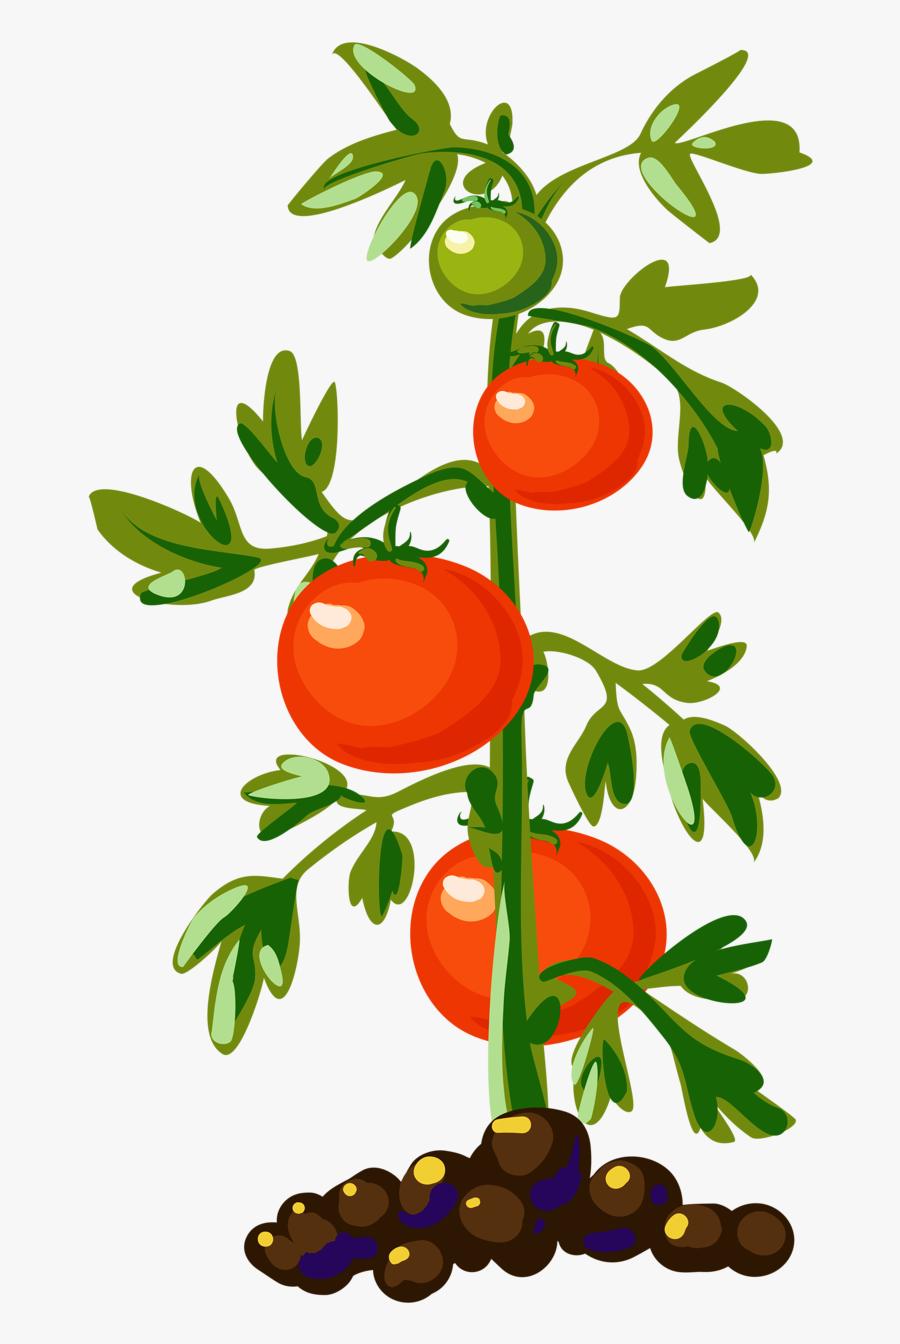 Thumb Image - Tomato Plant Clipart, Transparent Clipart